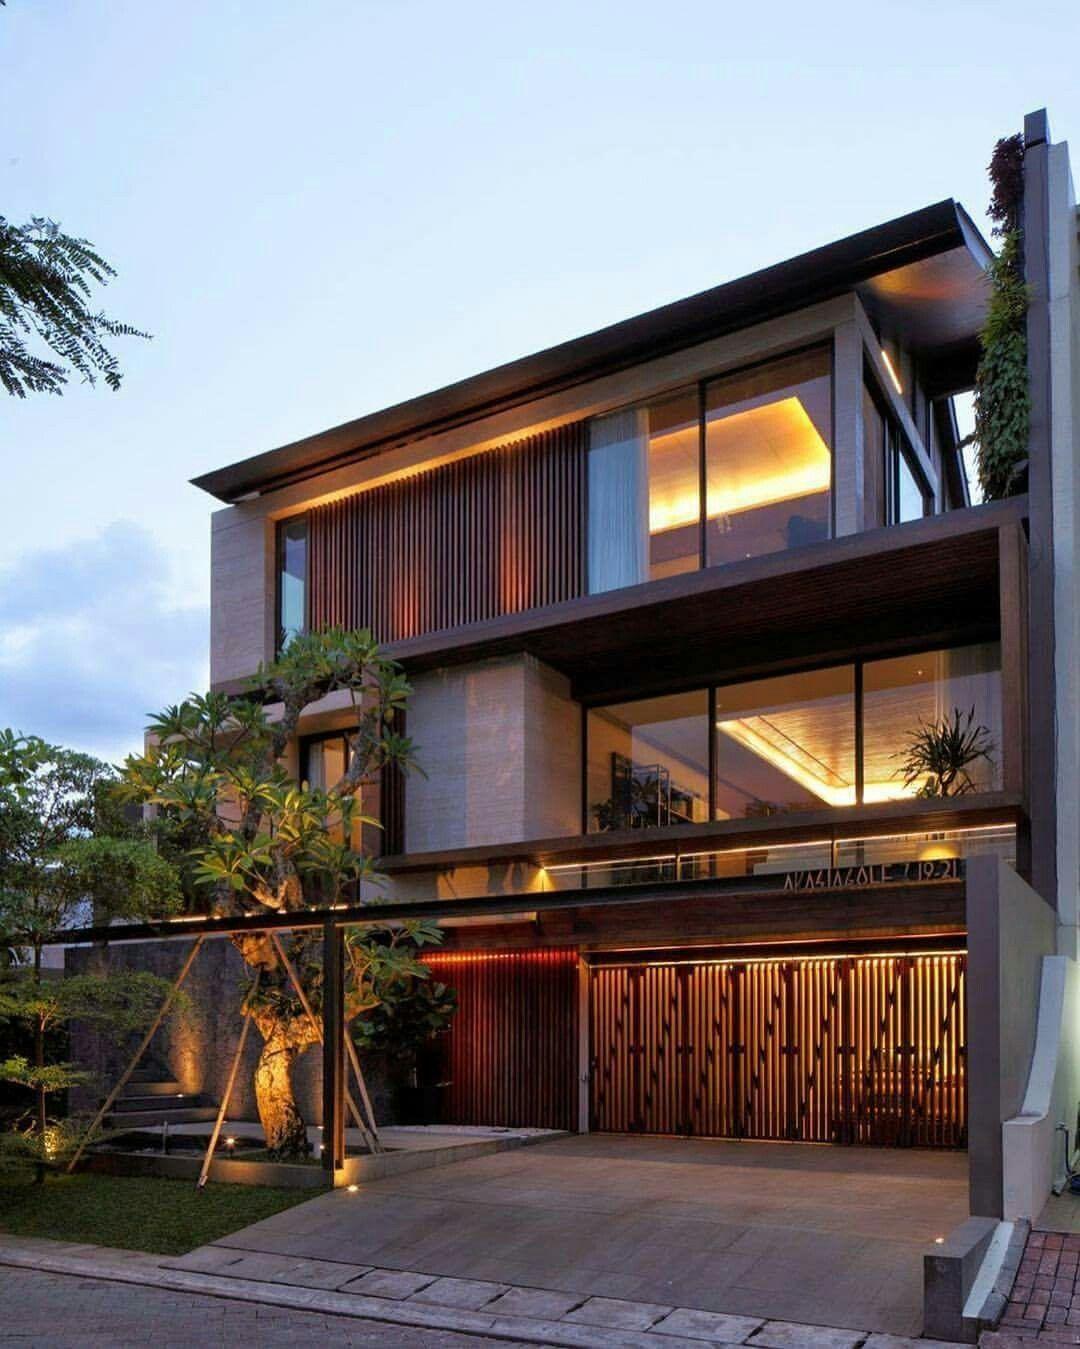 Home Design Ideas Architecture: Jakarta House By Nataneka Architects In Jakarta,#Indonesia